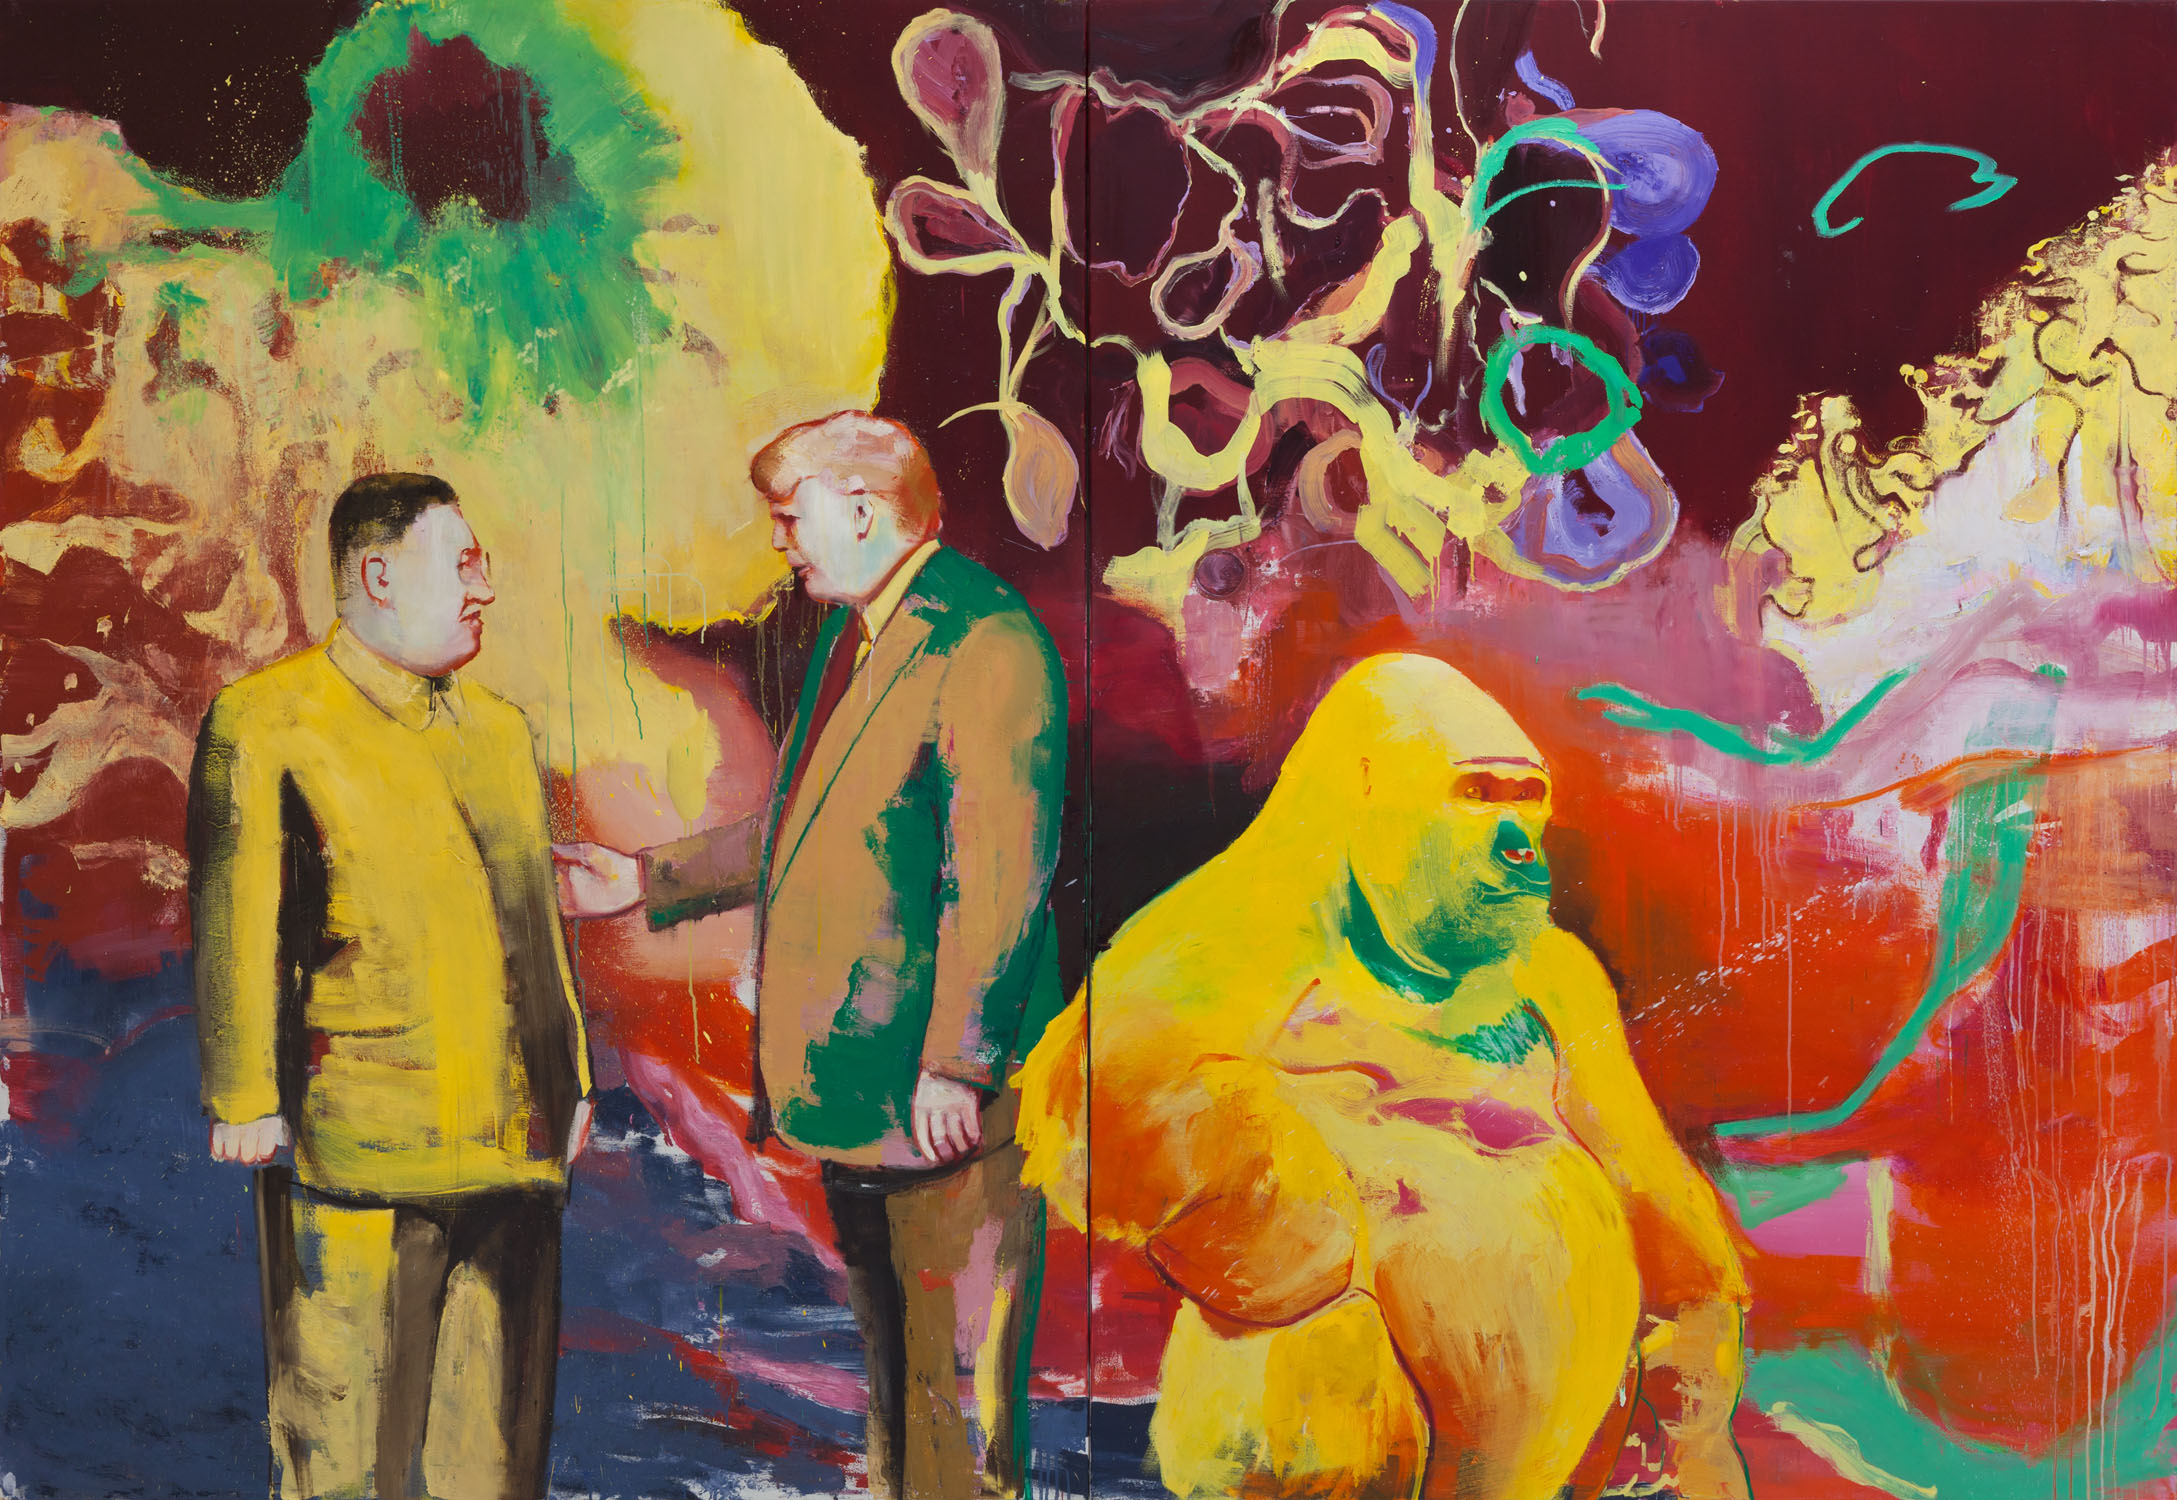 Casper Verborg | offspring | oil on canvas | 220 x 320 cm | 2018